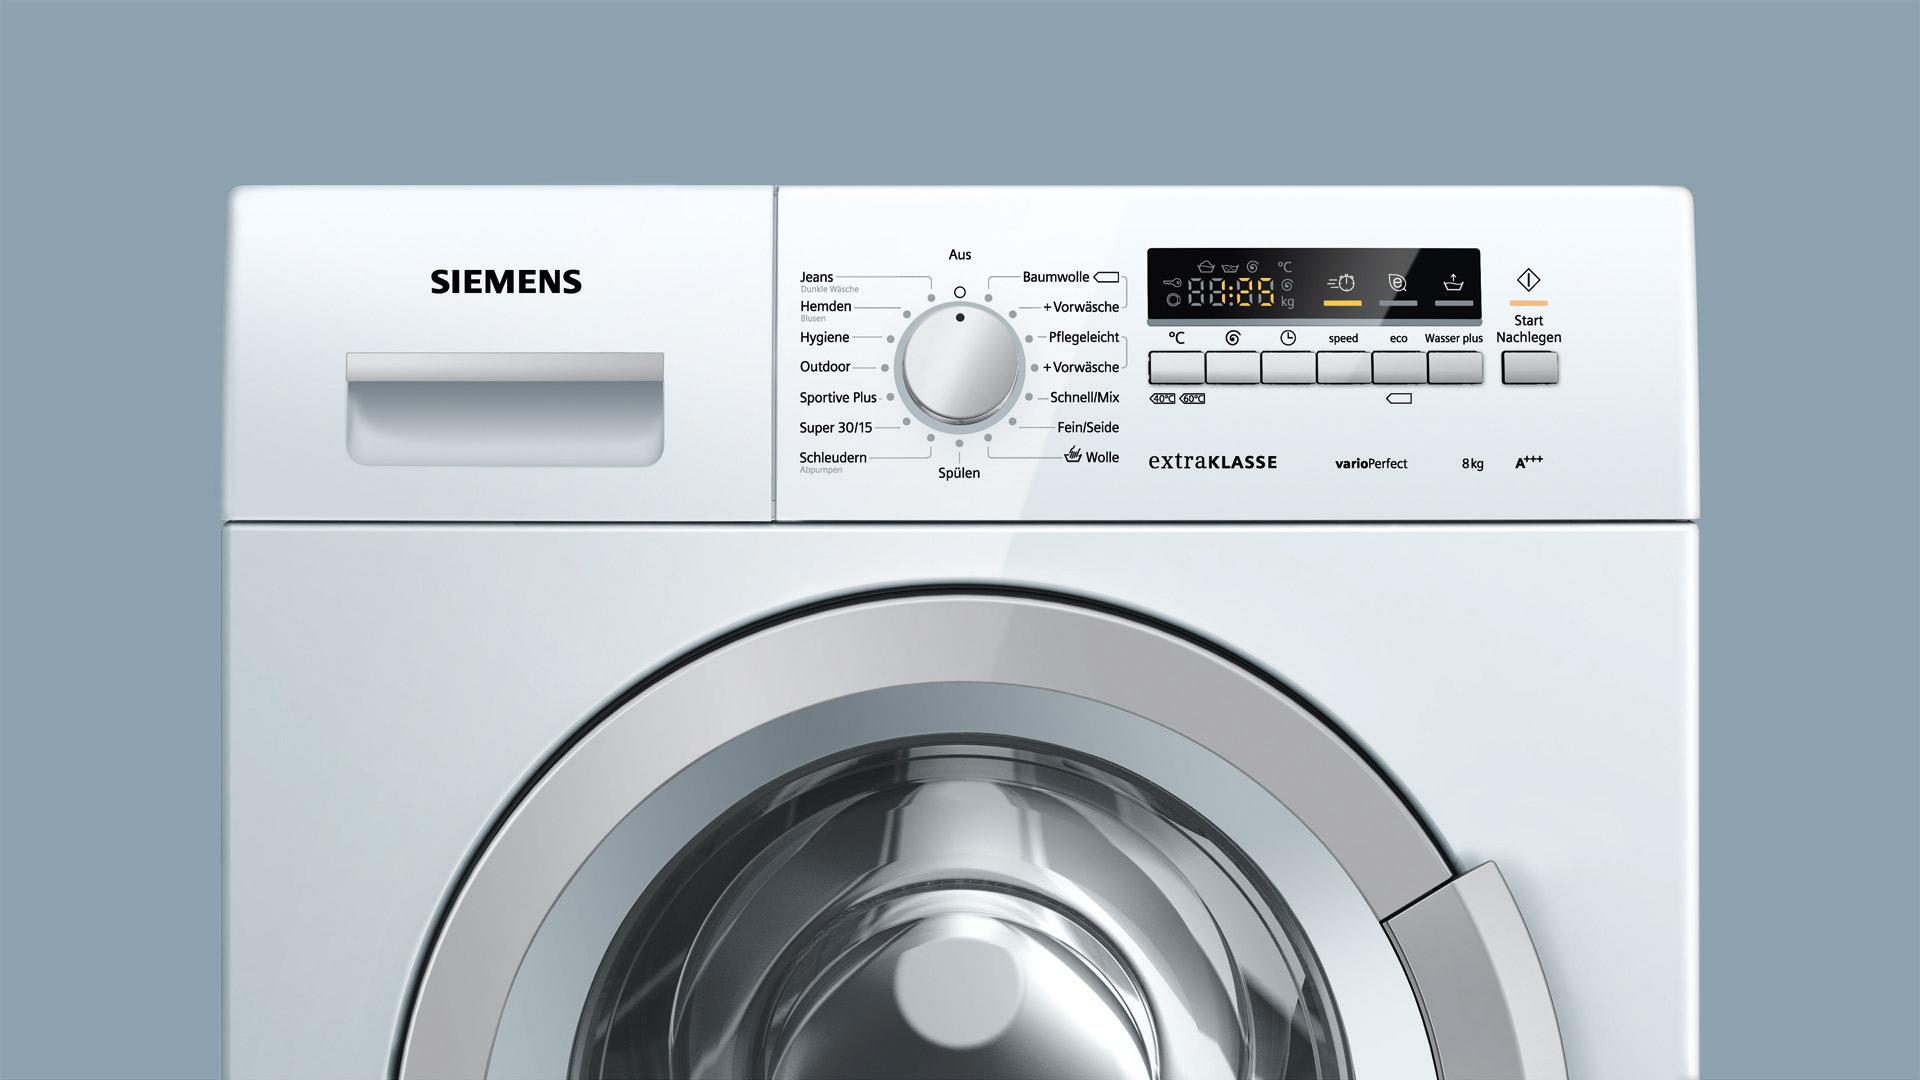 Siemens extraklasse waschmaschine wm k a vs elektro